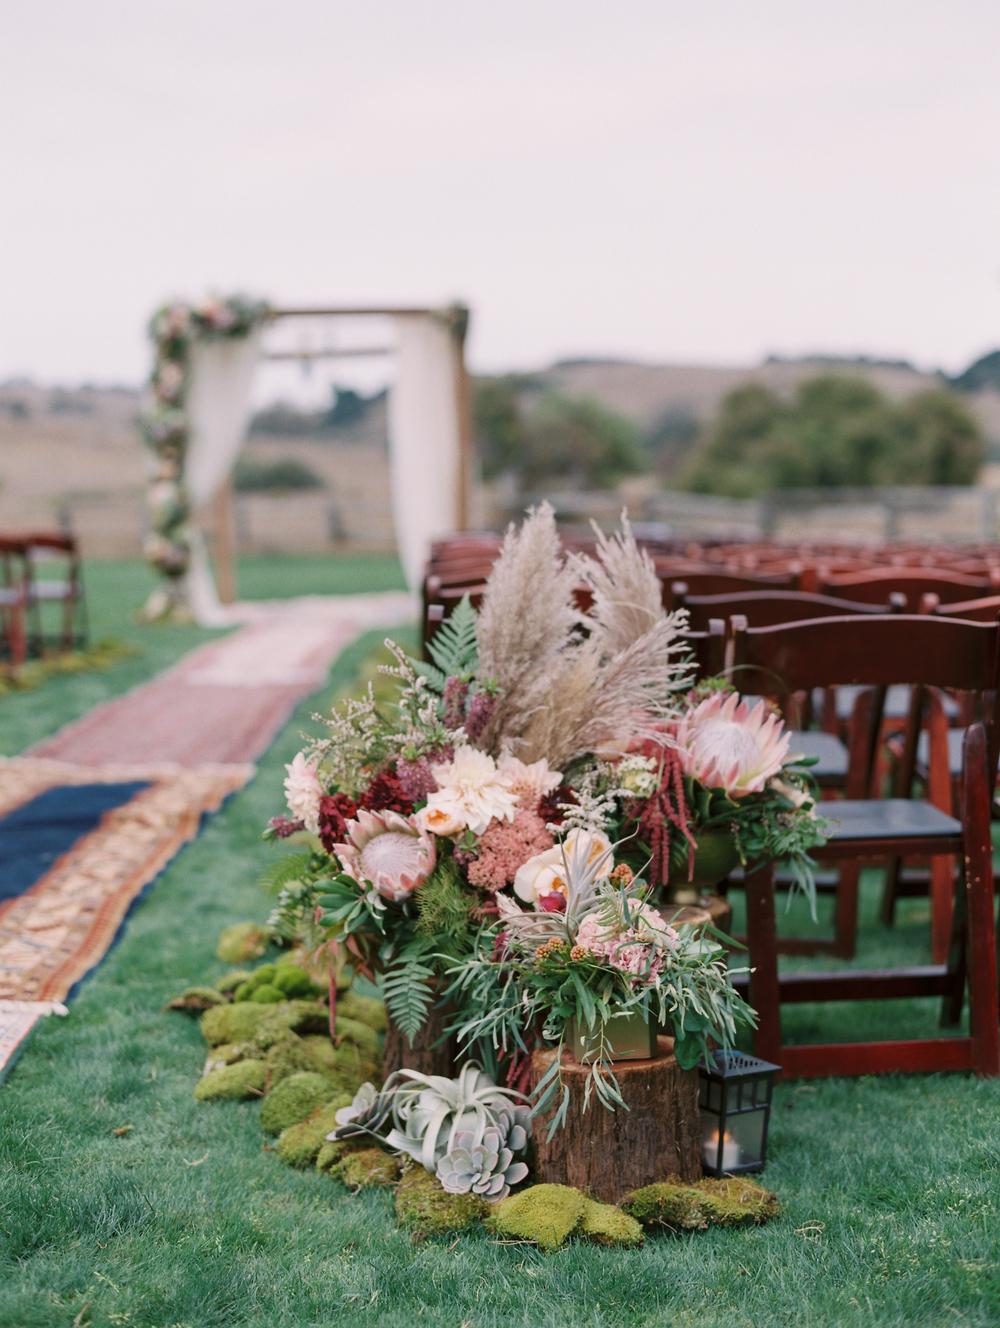 JENNIFER-SKOG-dane-nate-santa-lucia-preserve-wedding-0481.jpg